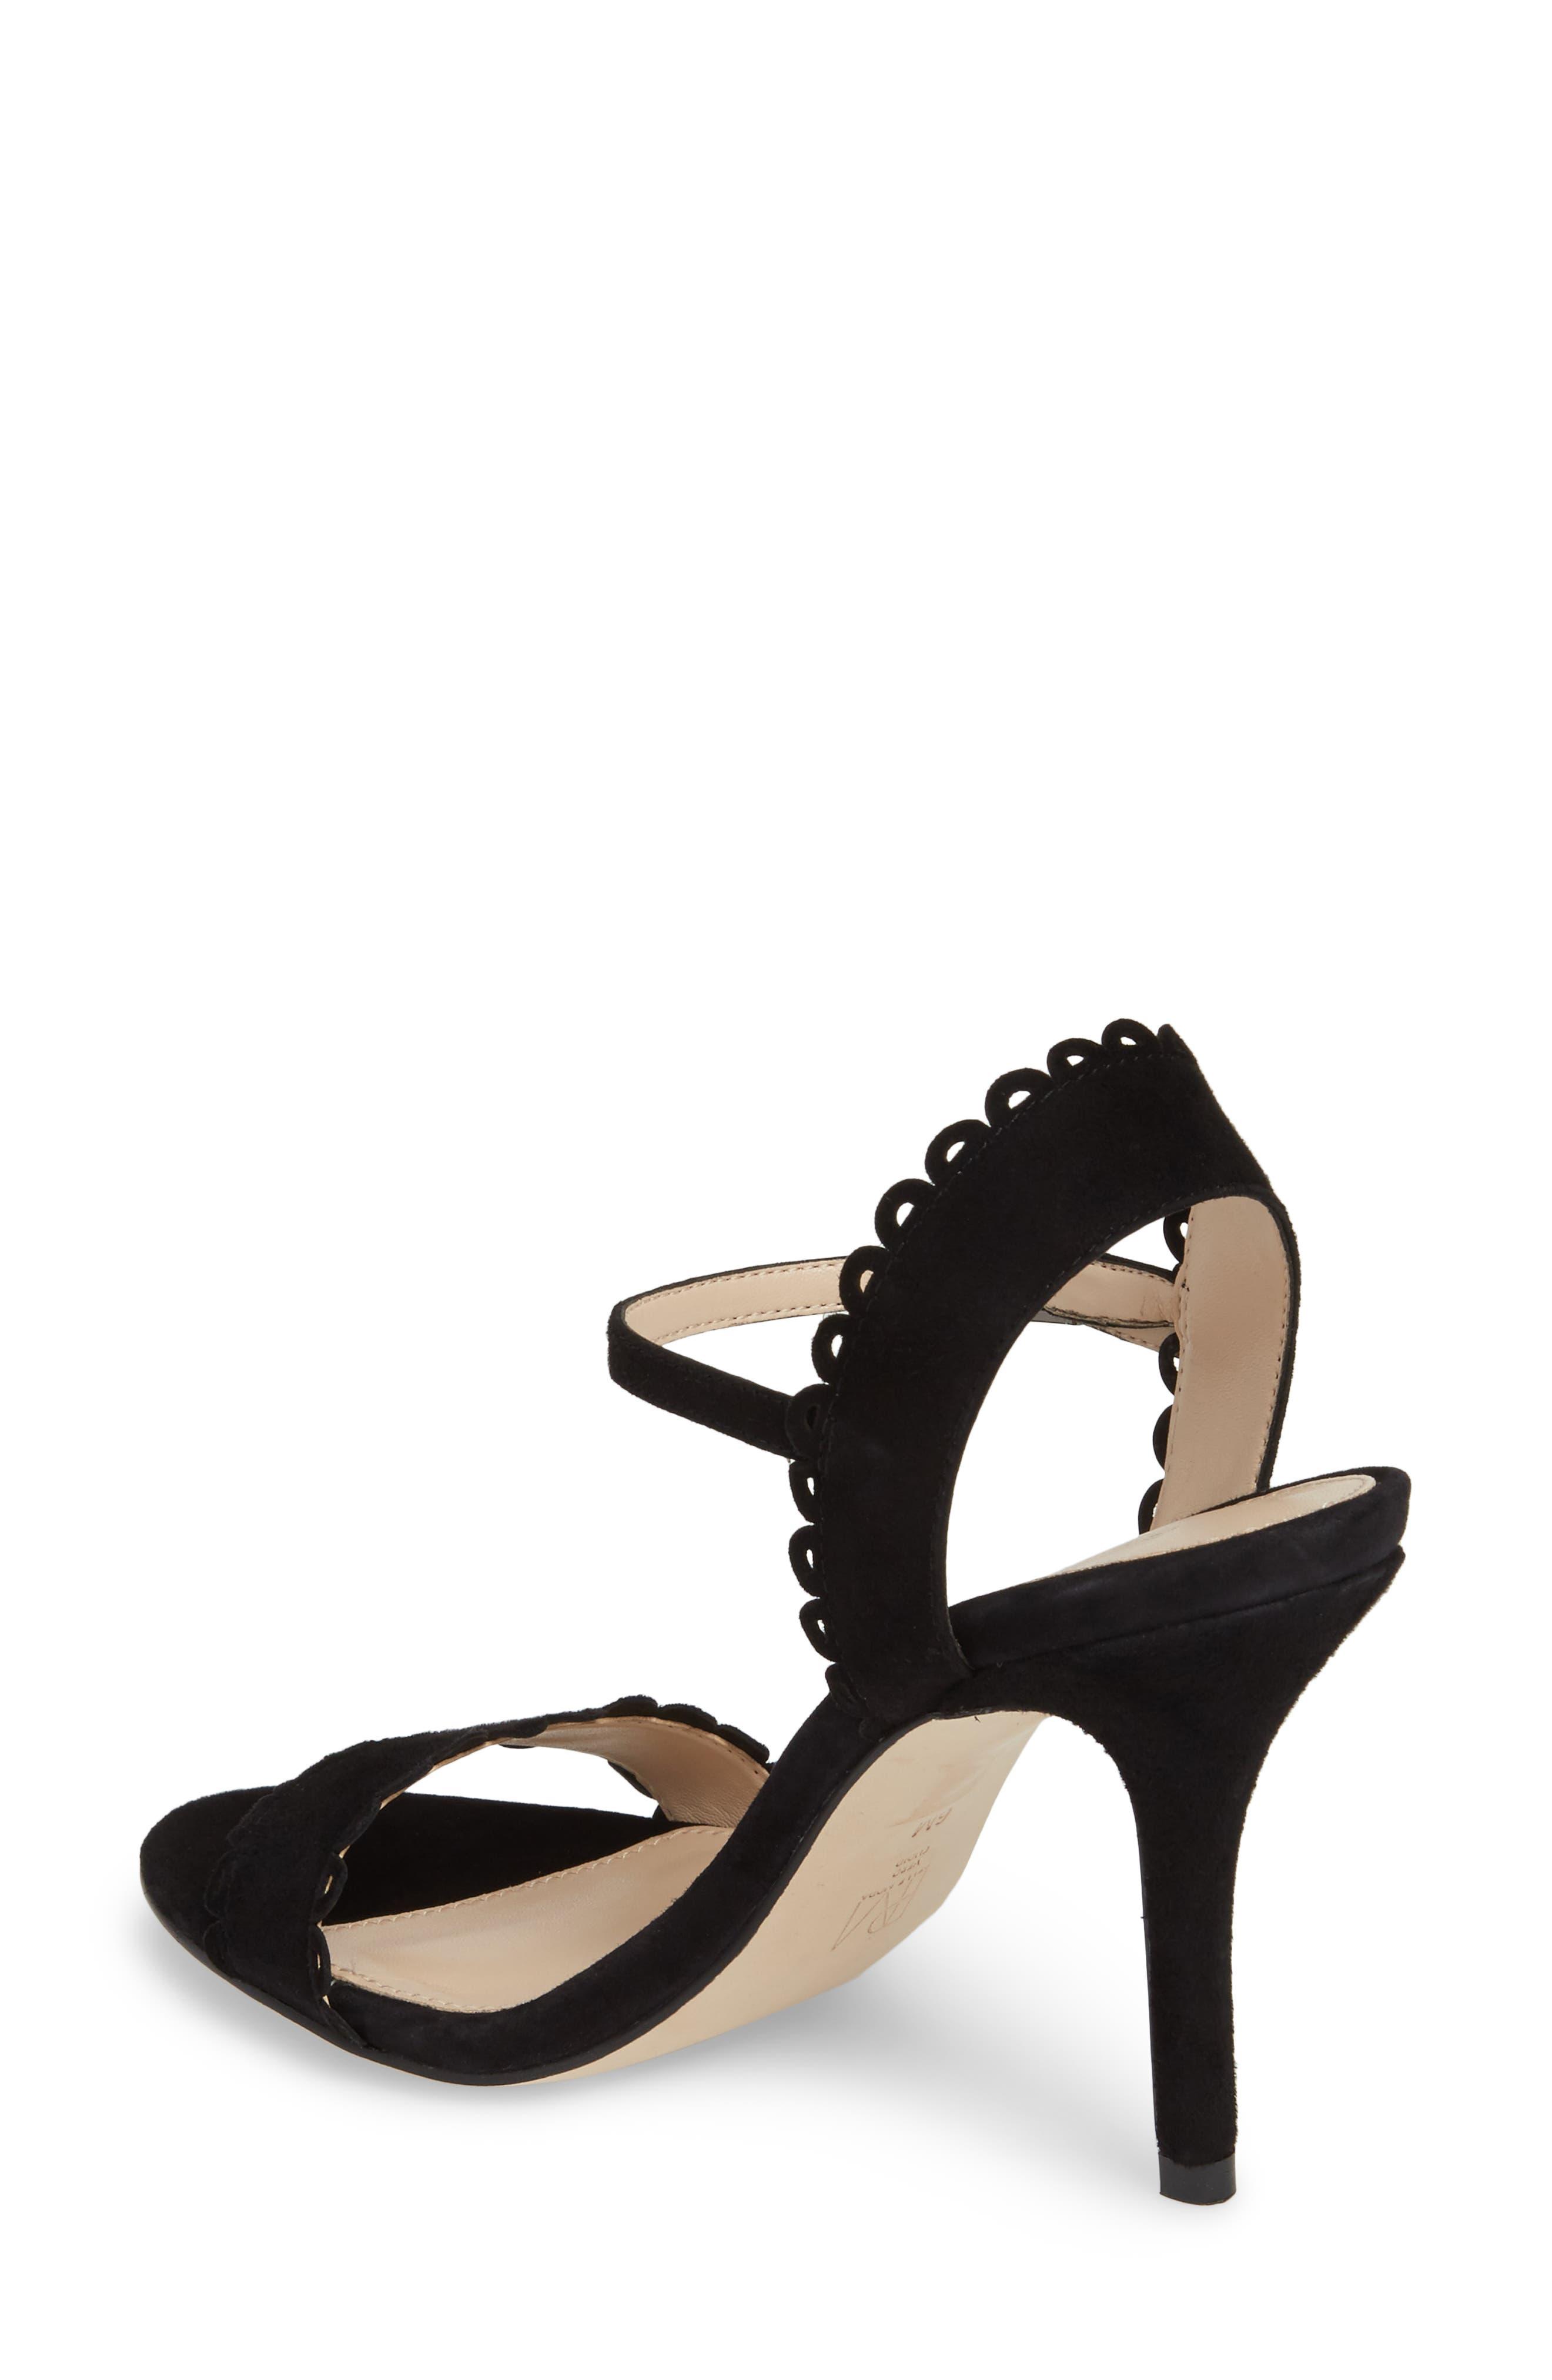 Karen Scallop Ankle Strap Sandal,                             Alternate thumbnail 4, color,